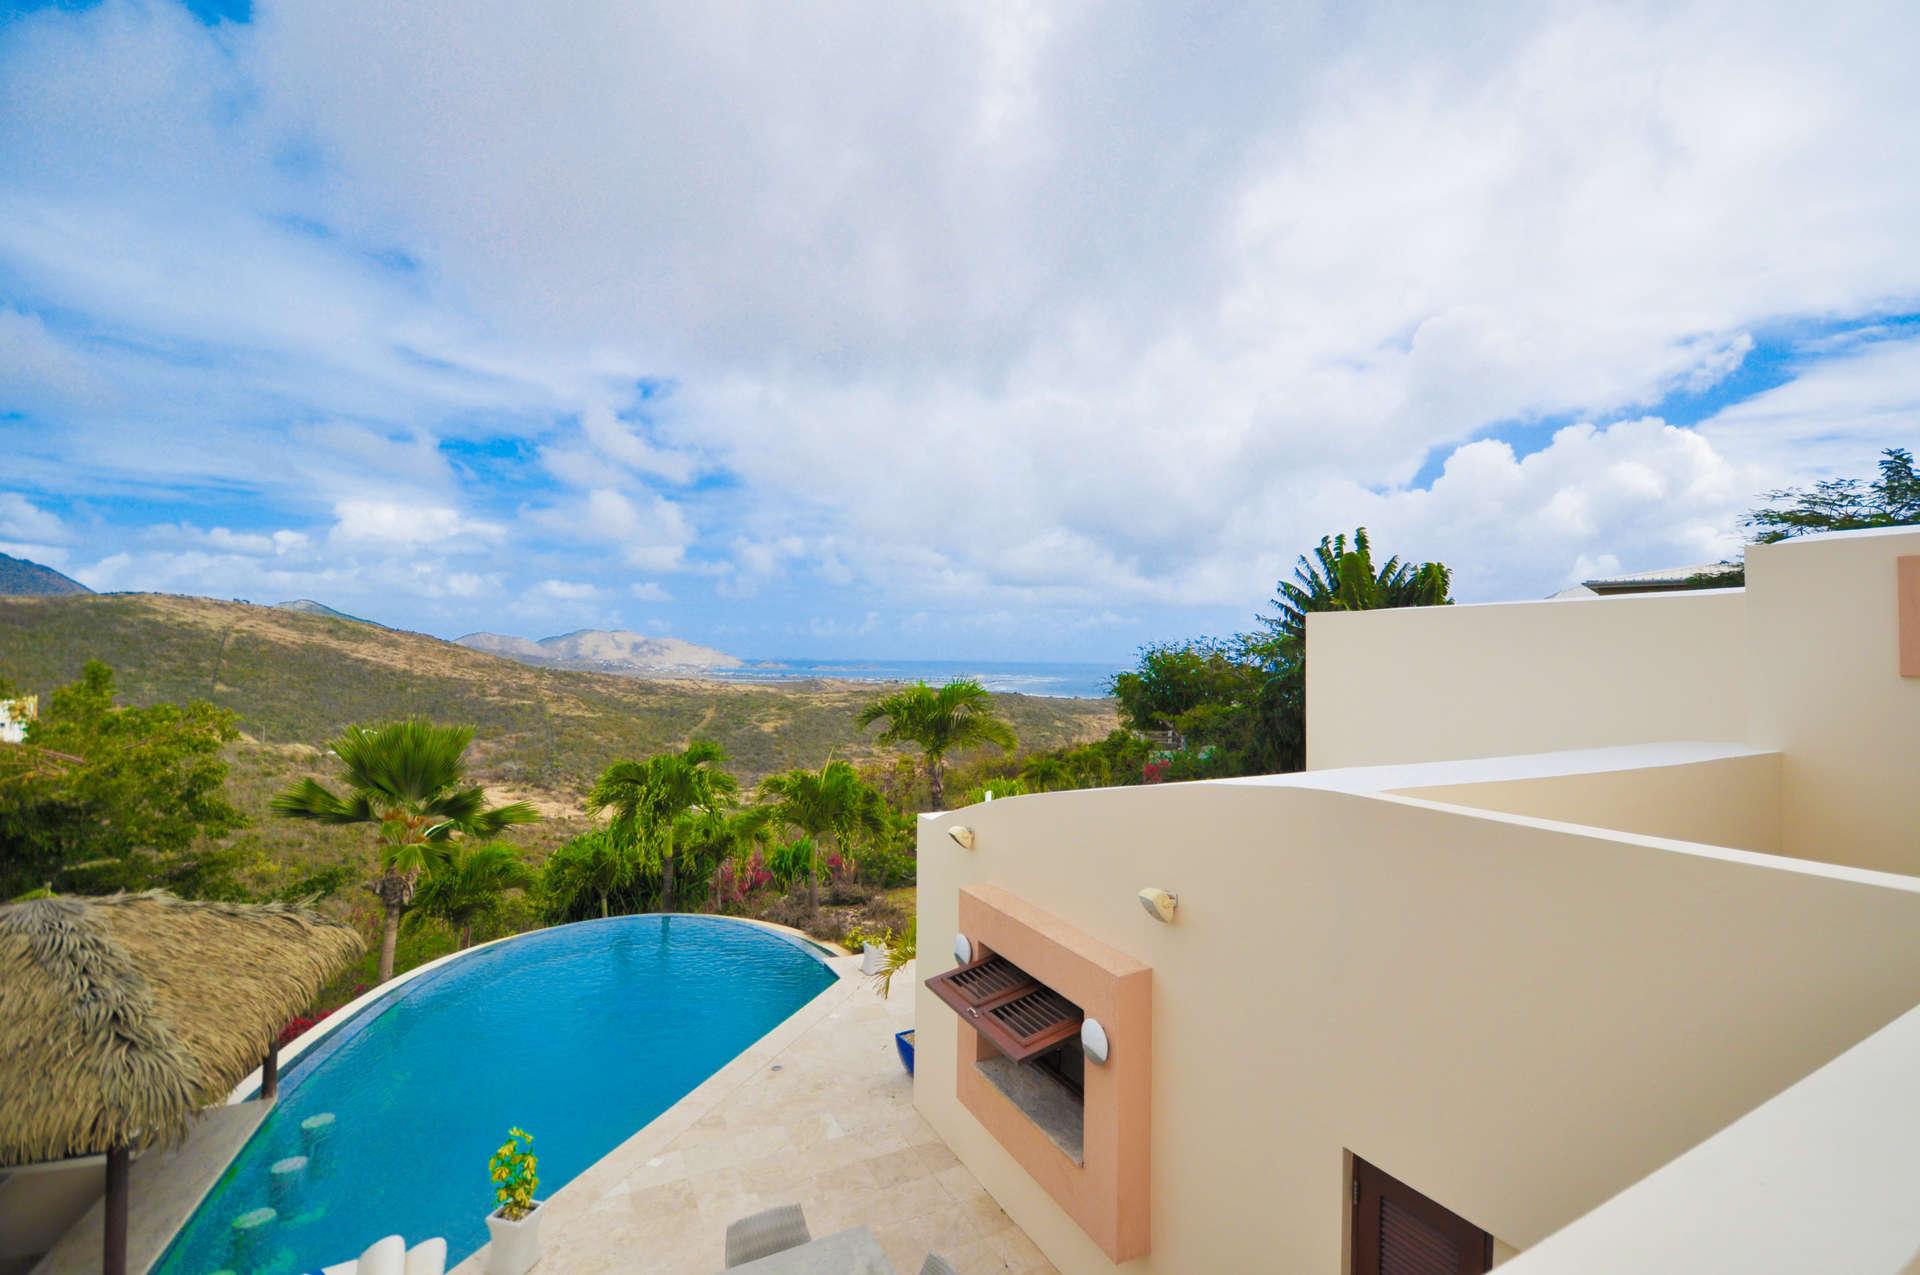 Luxury villa rentals caribbean - St martin - Sint maarten - Oyster pond - On Island Time - Image 1/12